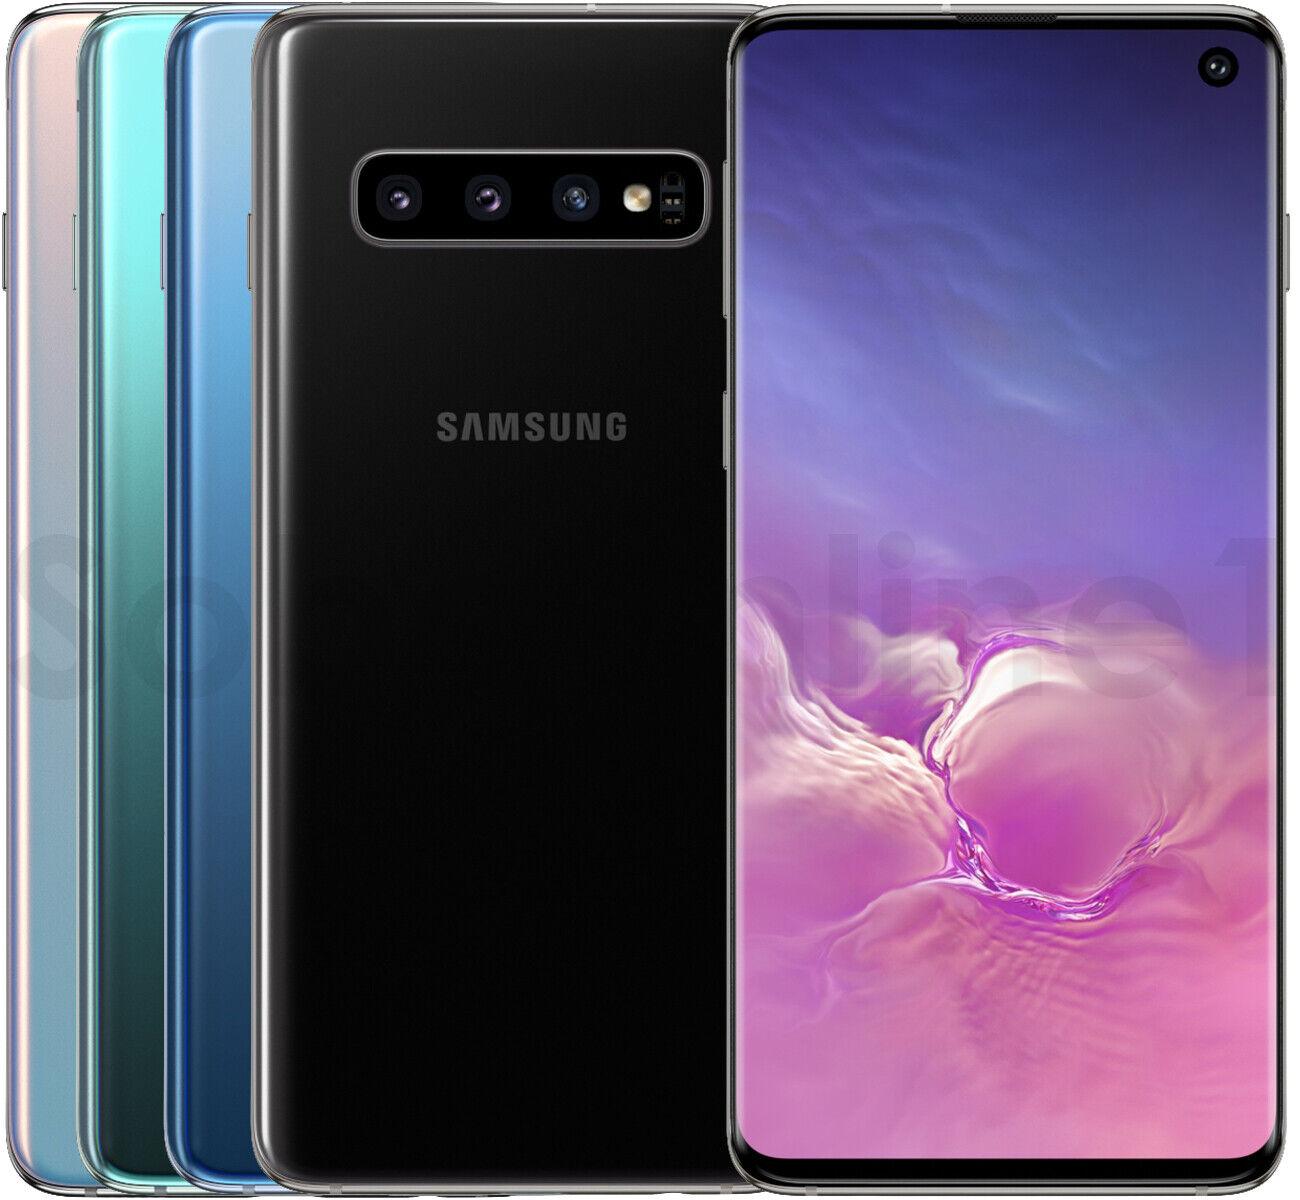 "Android Phone - Samsung Galaxy S10 SM-G973F/DS 128GB Dual Sim (FACTORY UNLOCKED) 6.1"" 8GB RAM"